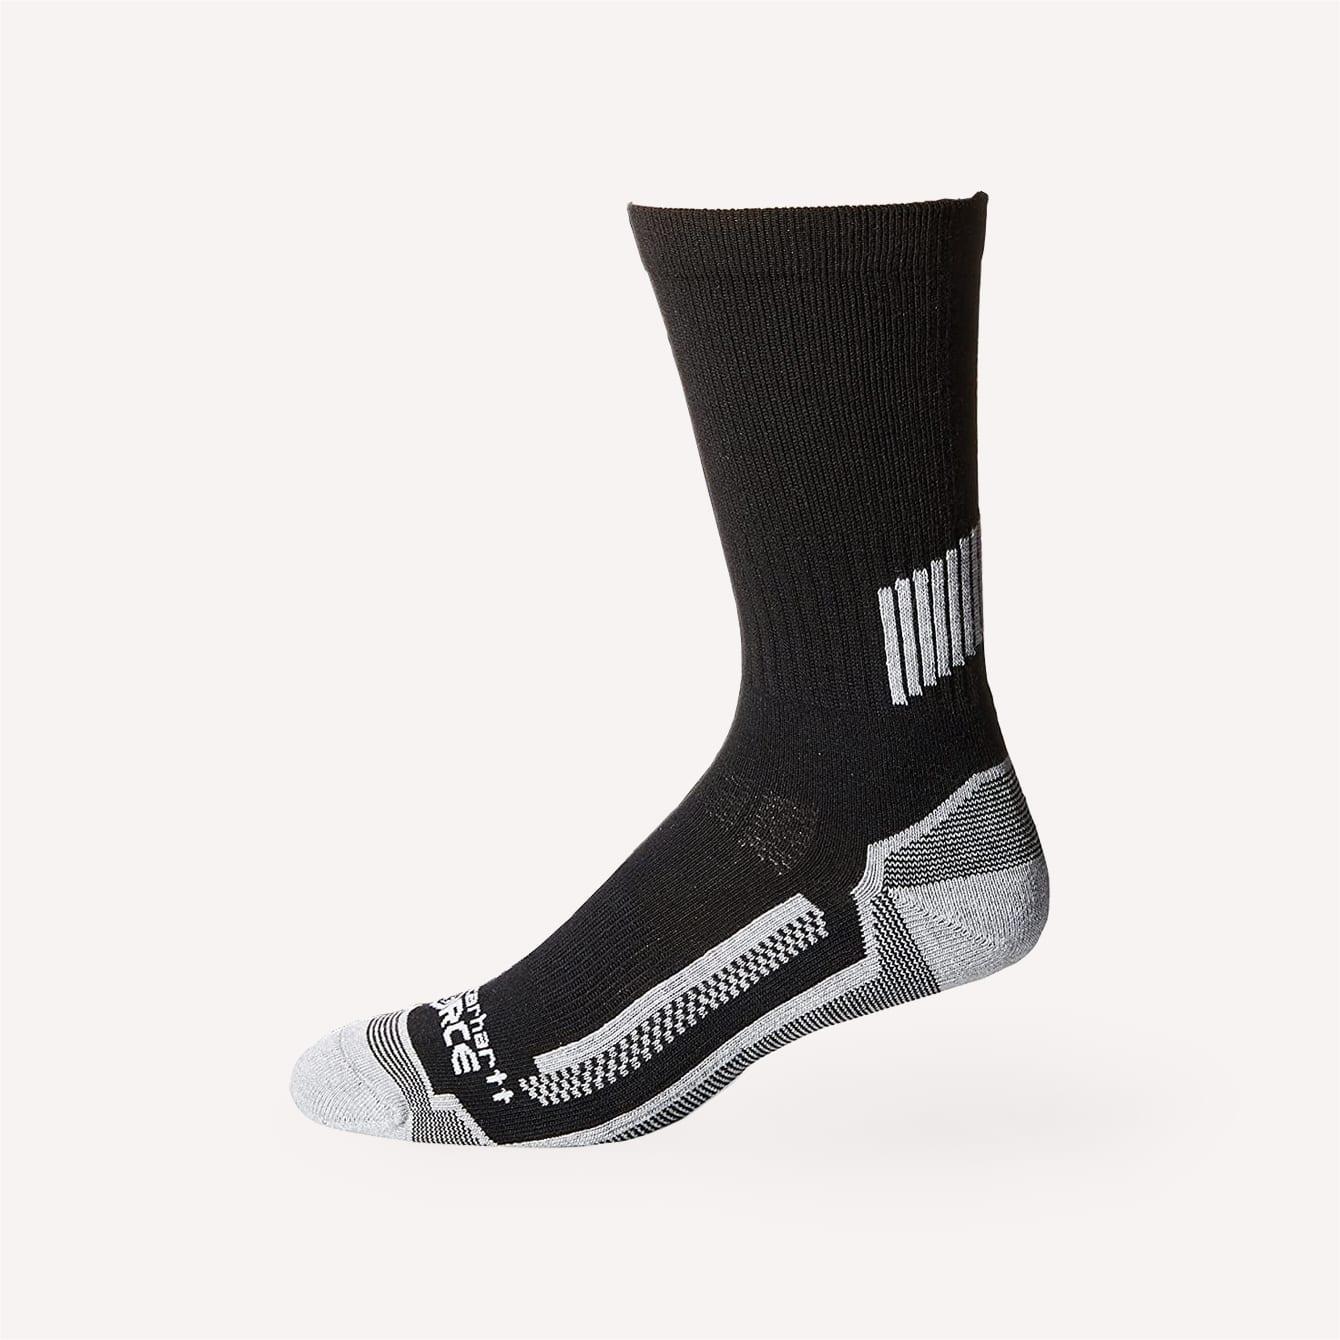 Carhartt Men's Force Performance Work Crew Socks